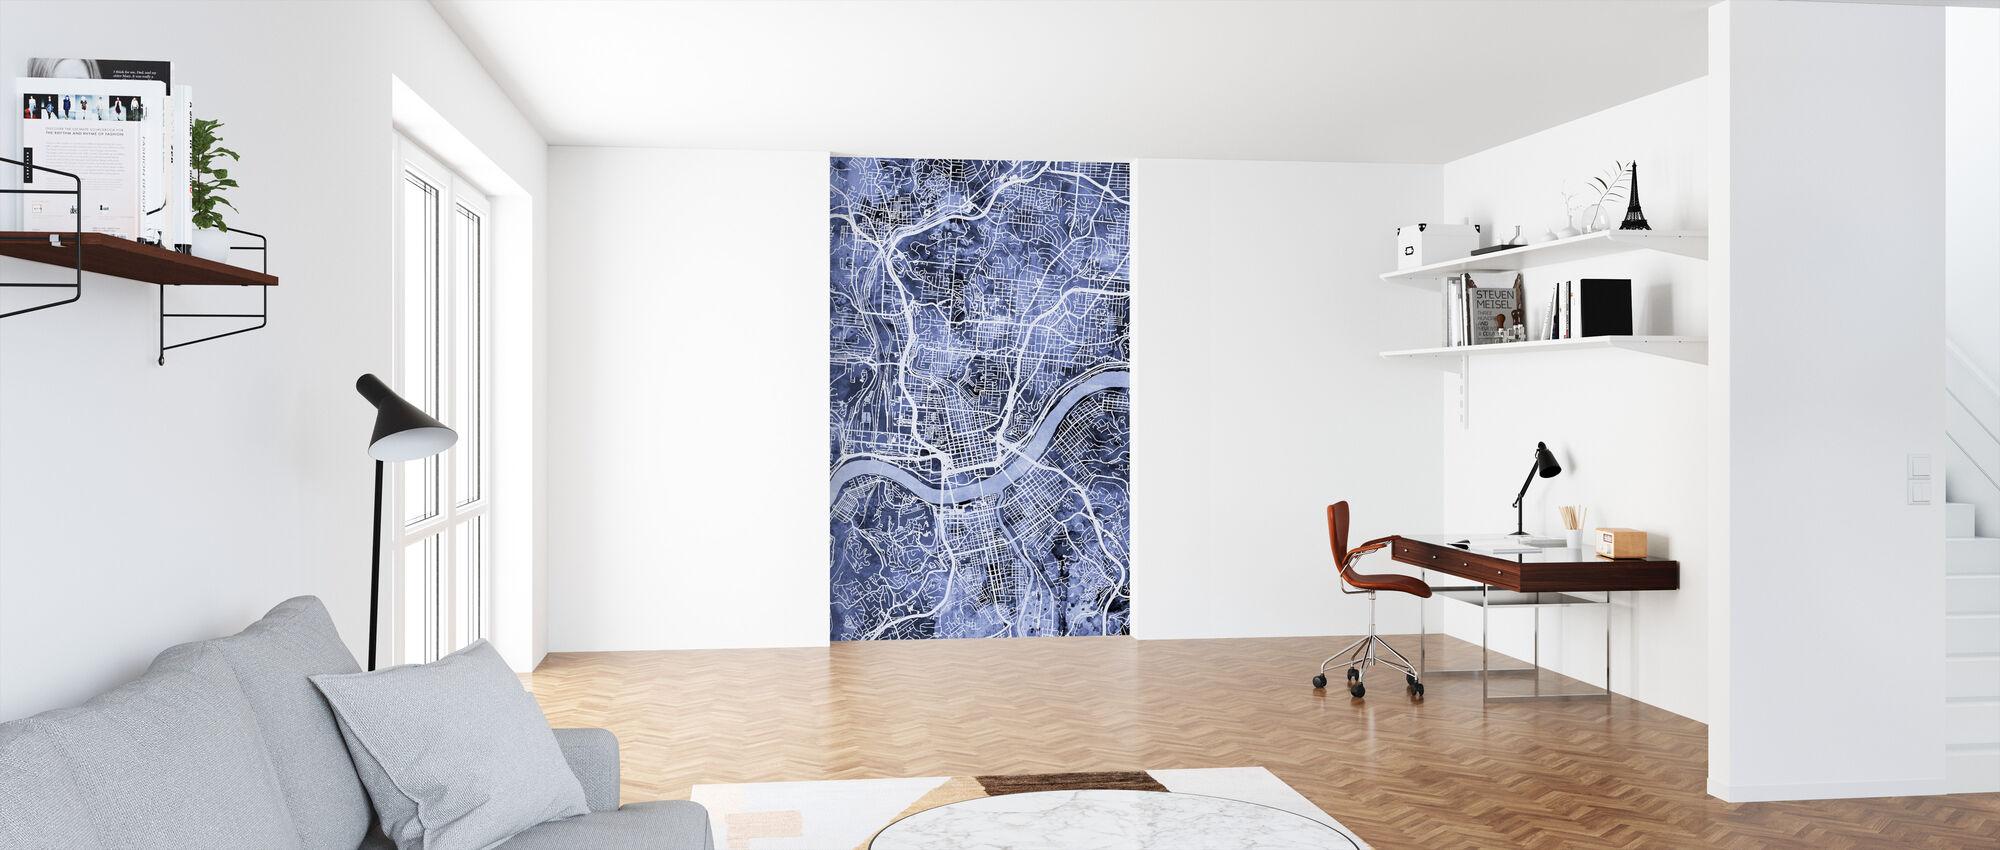 Cincinnati Ohio City Map - Wallpaper - Office